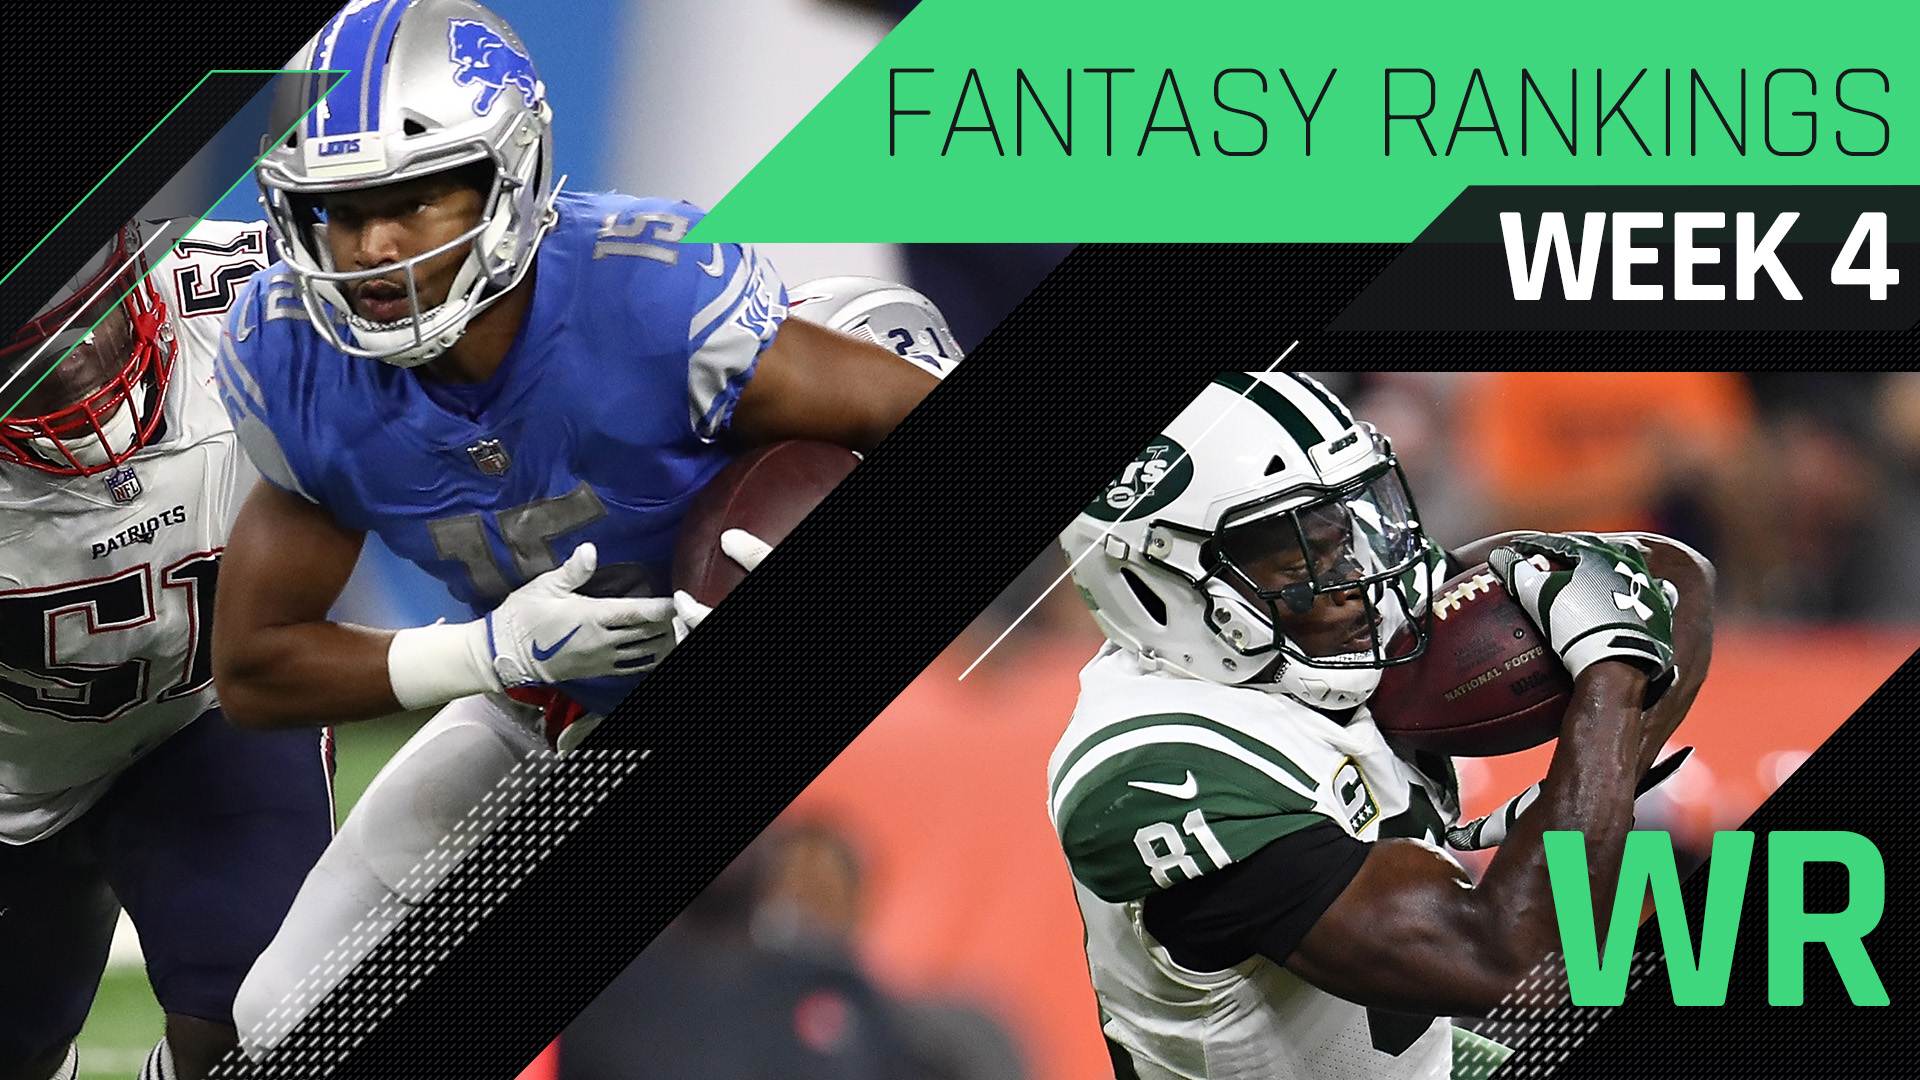 d73d5a331b4 Week 4 Fantasy Rankings: WR | Sporting News Canada